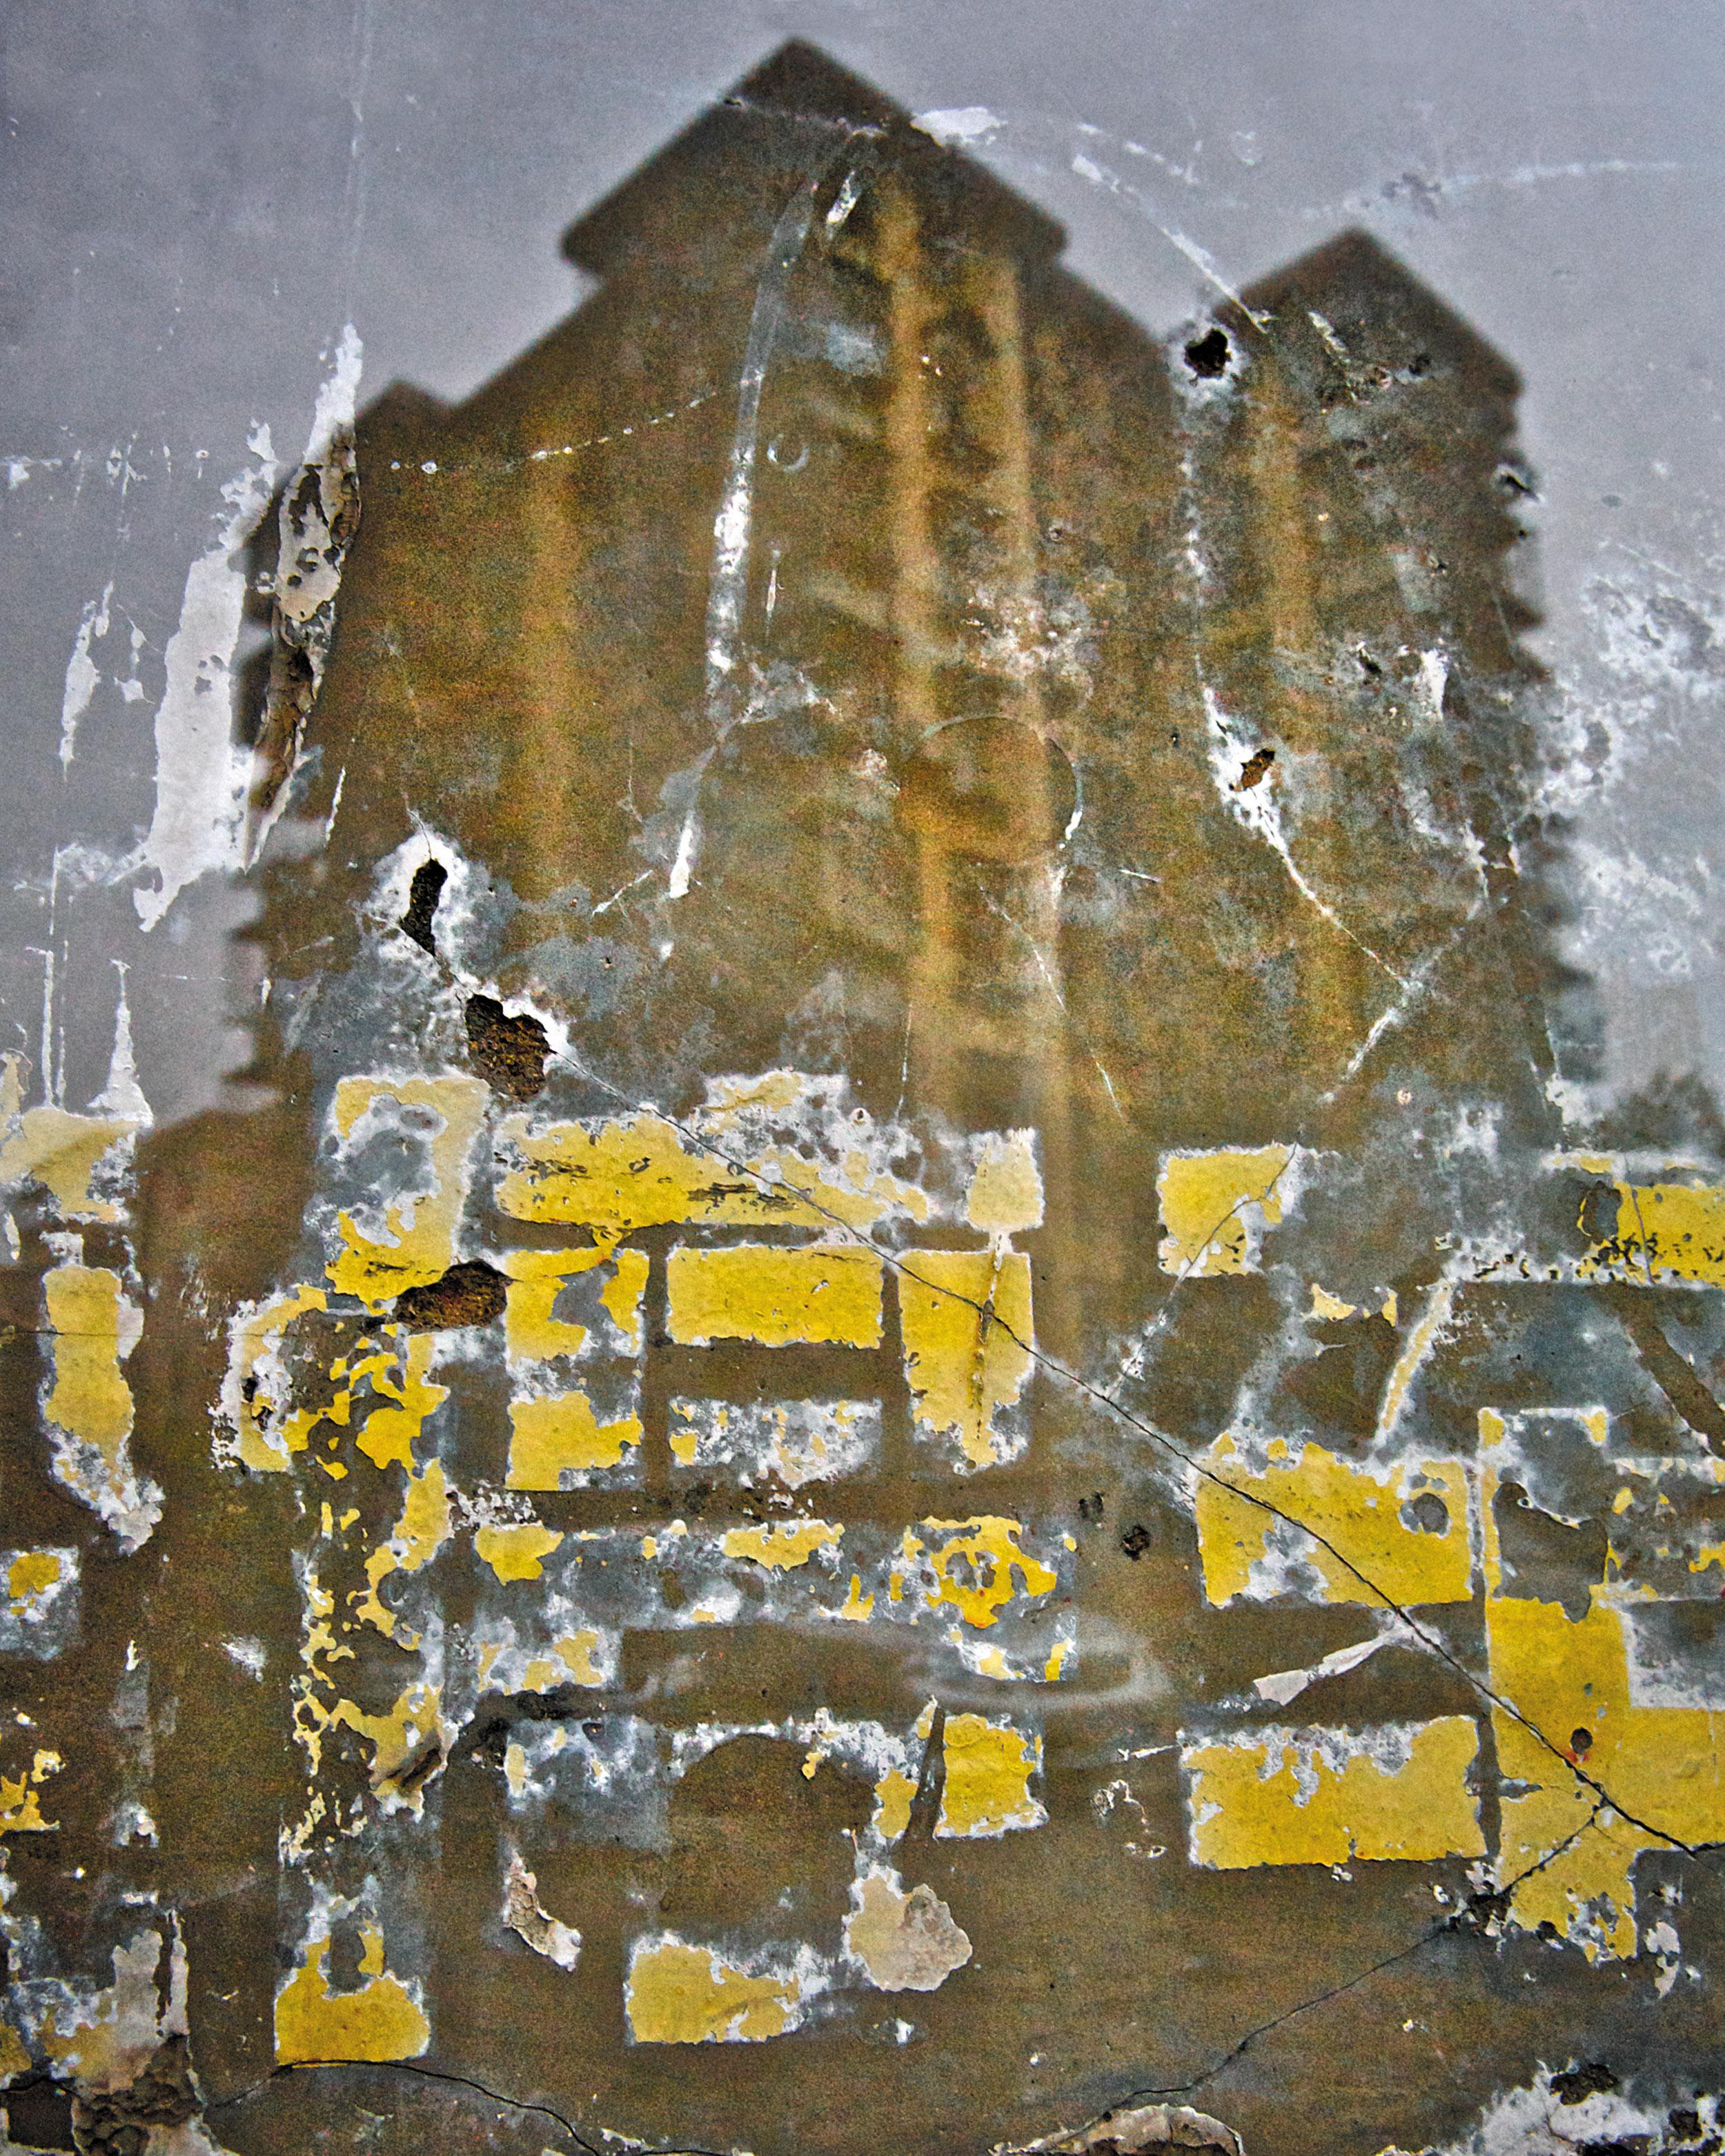 Marcel Heijnen, Transit, China, 2011